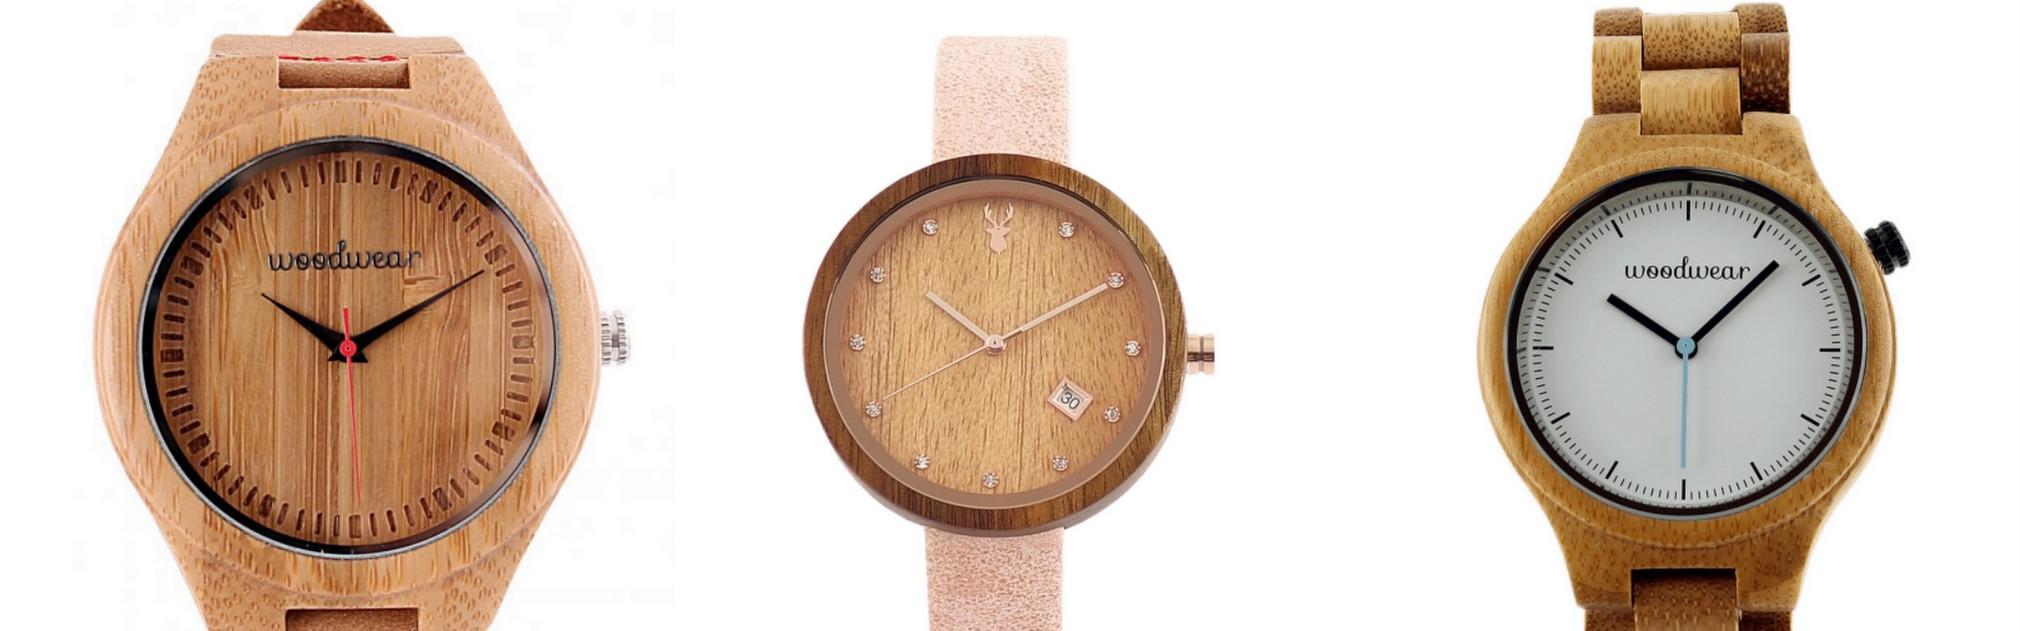 Drewniany zegarek WoodWear